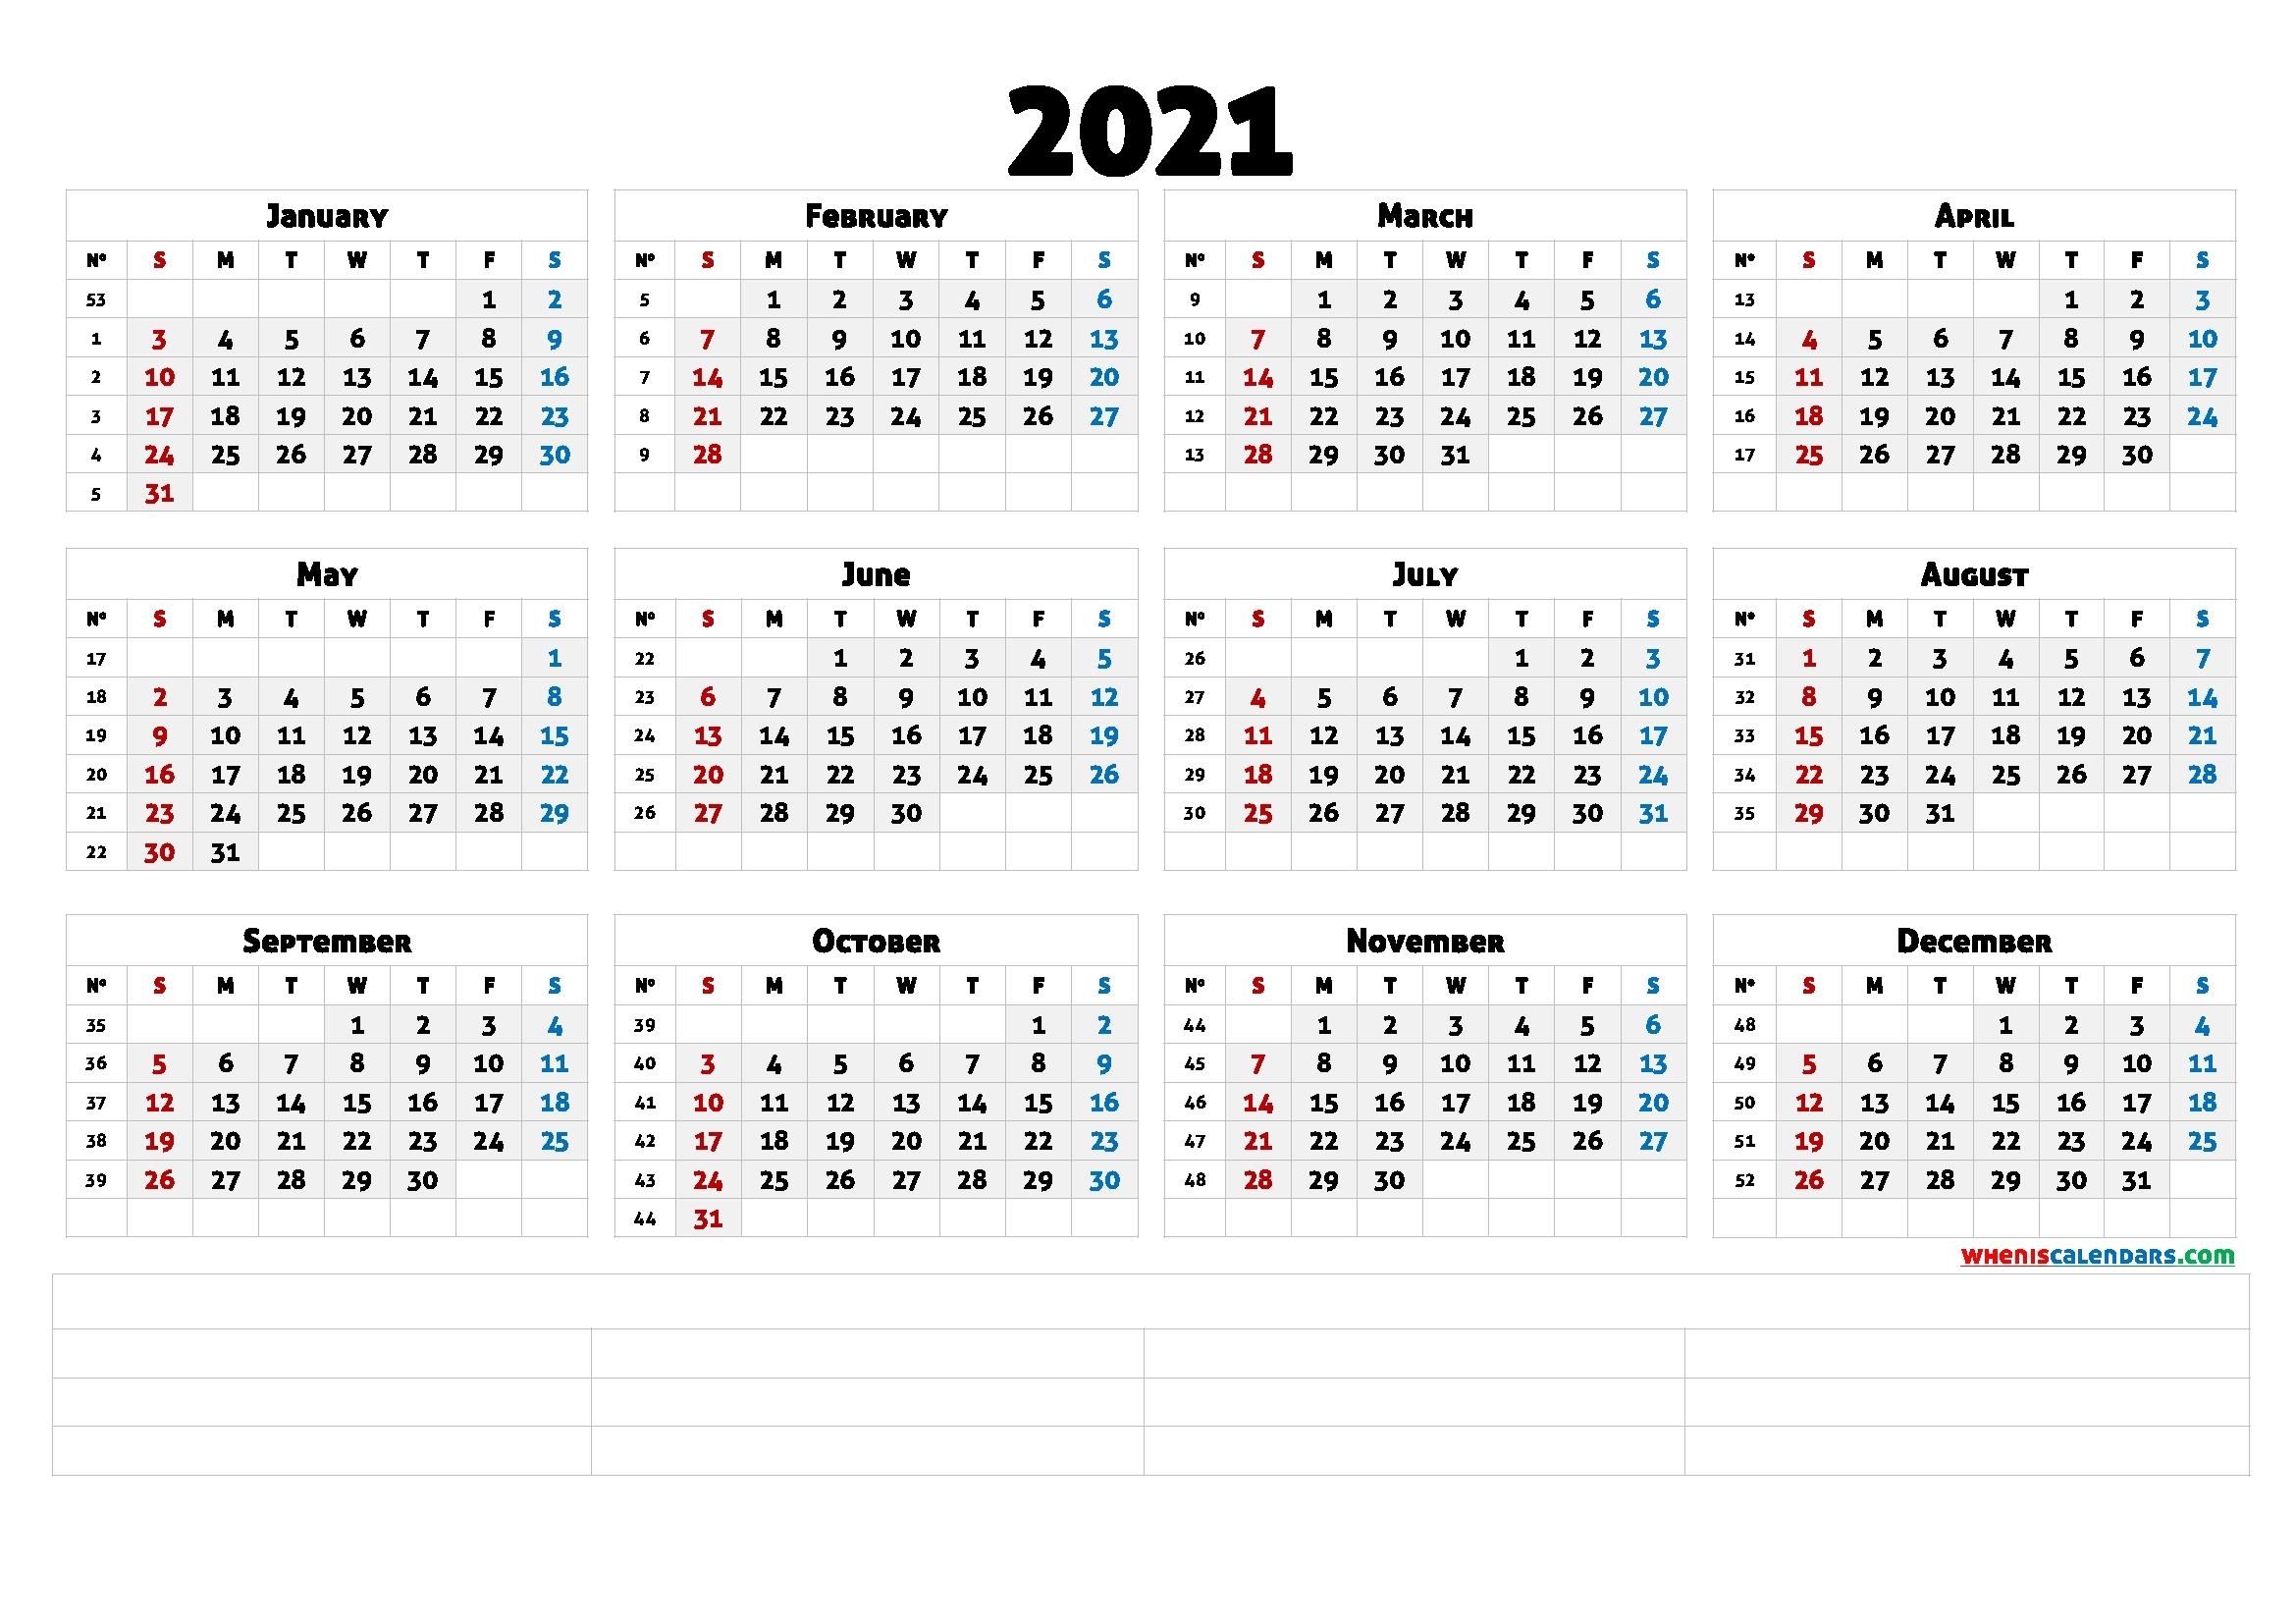 2021 Calendar With Week Number Printable Free : January